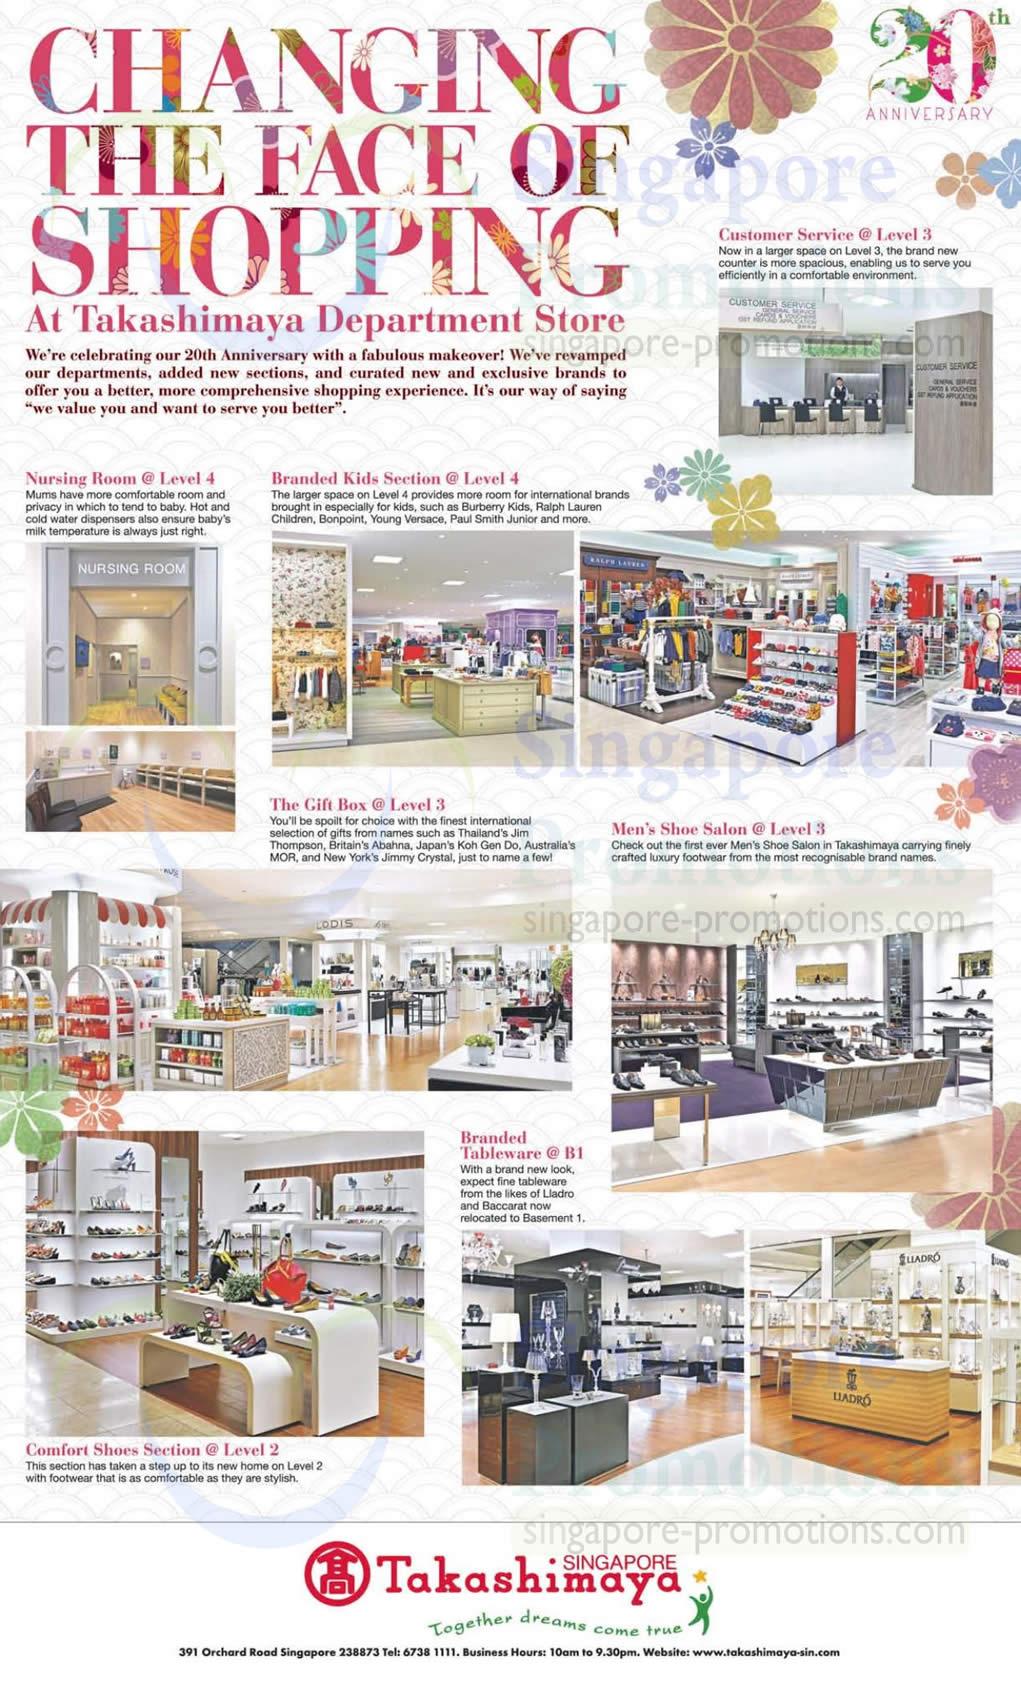 Dept Store Makeover Highlights, Branded Tableware, Gift Box, Mens Shoe Salon